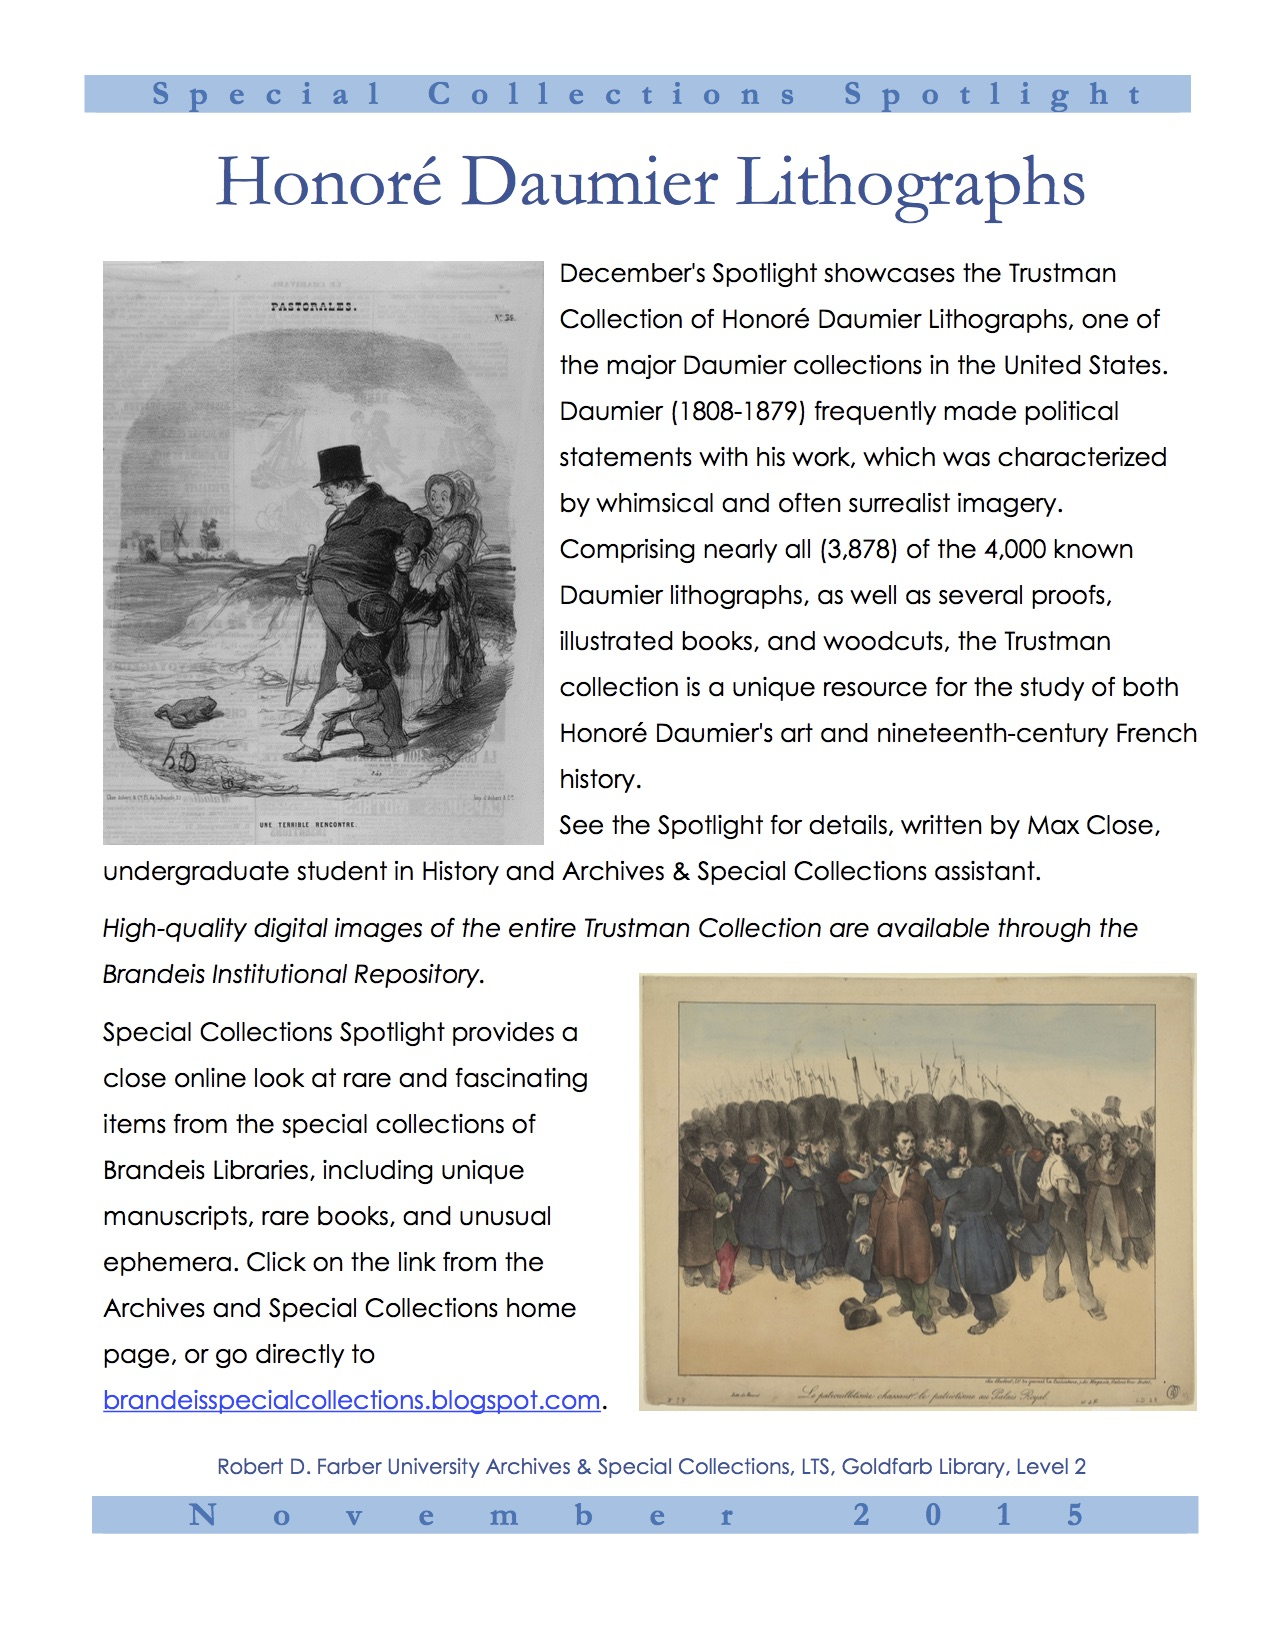 Daumier flyer